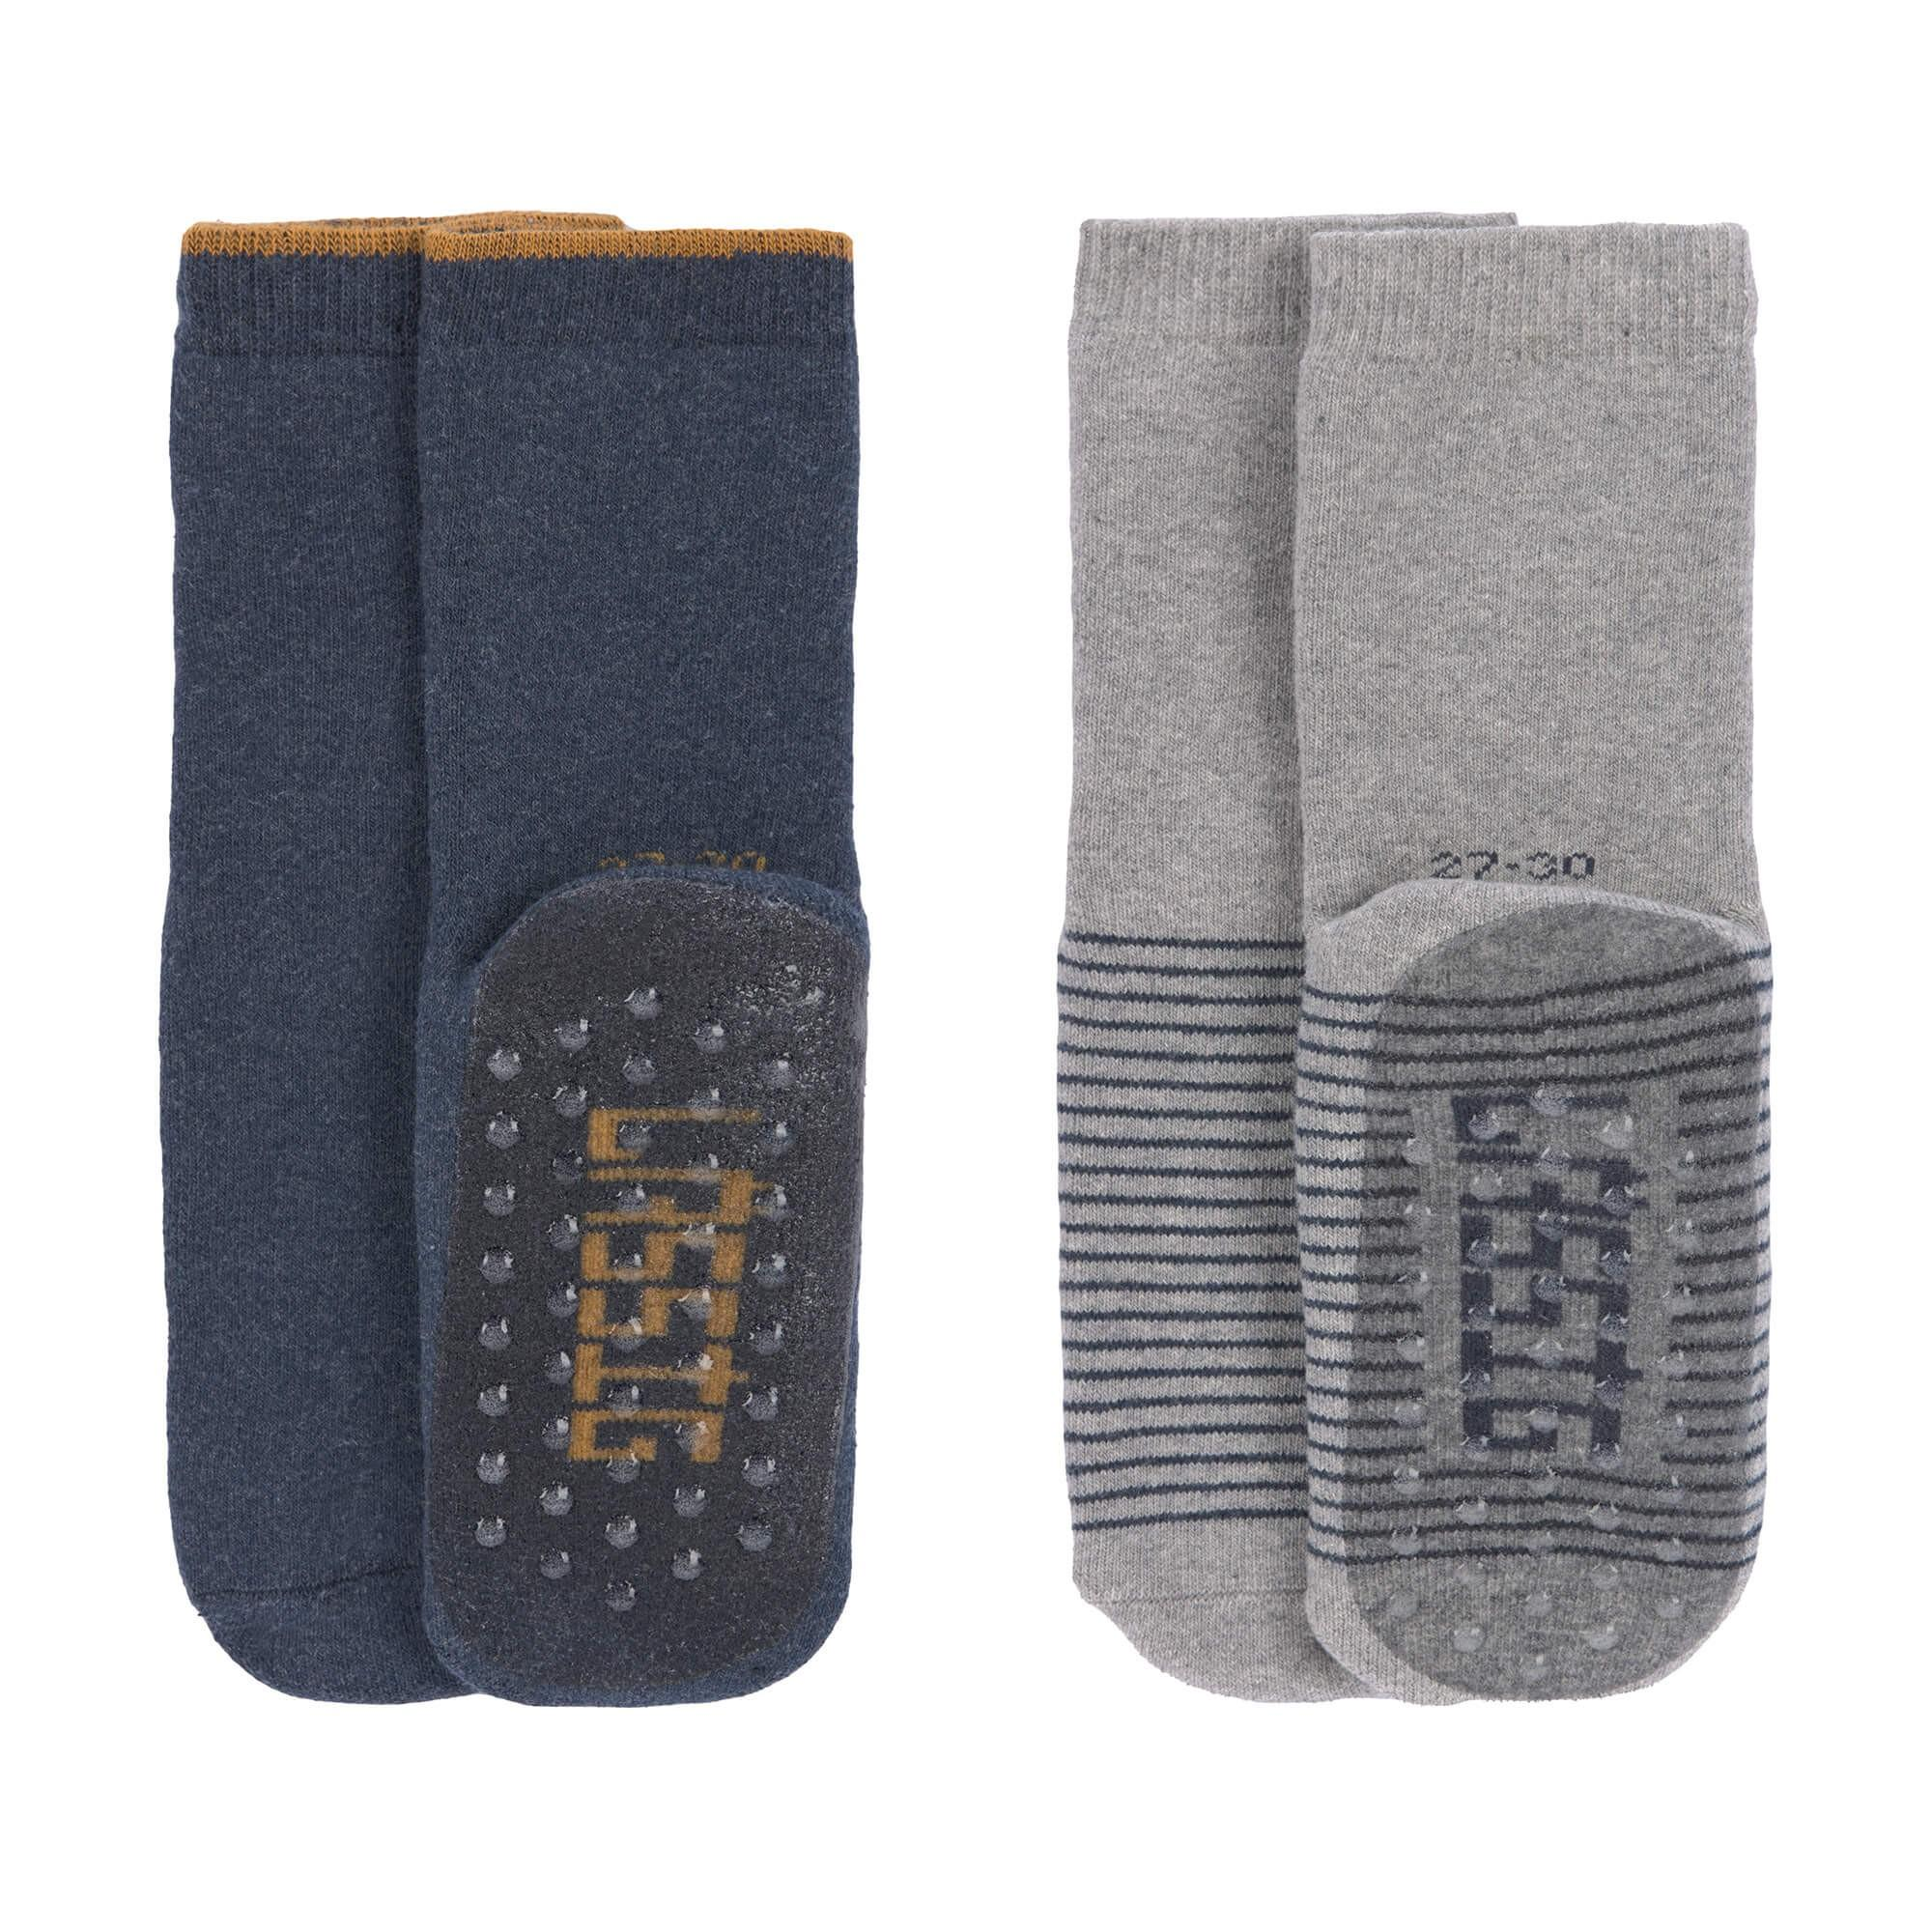 Lassig - Anti-slip Socks 2 pcs. assorted blue/grey, Size: 27-30